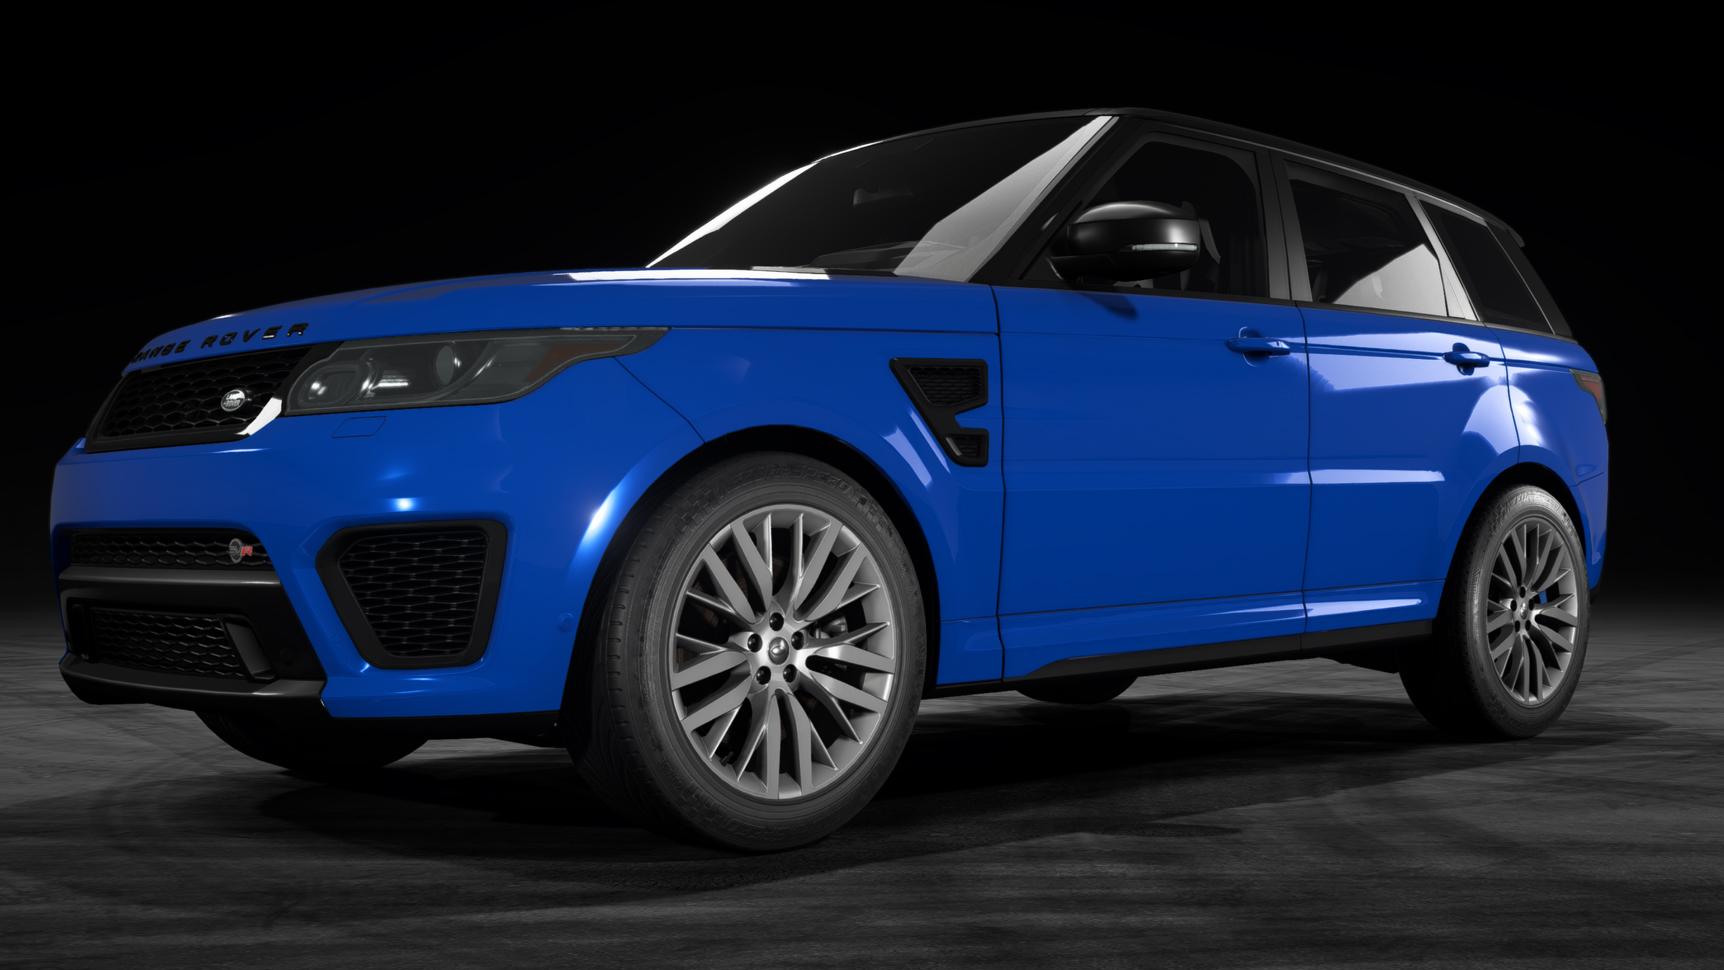 Land Rover Range Rover Sport SVR (L494)